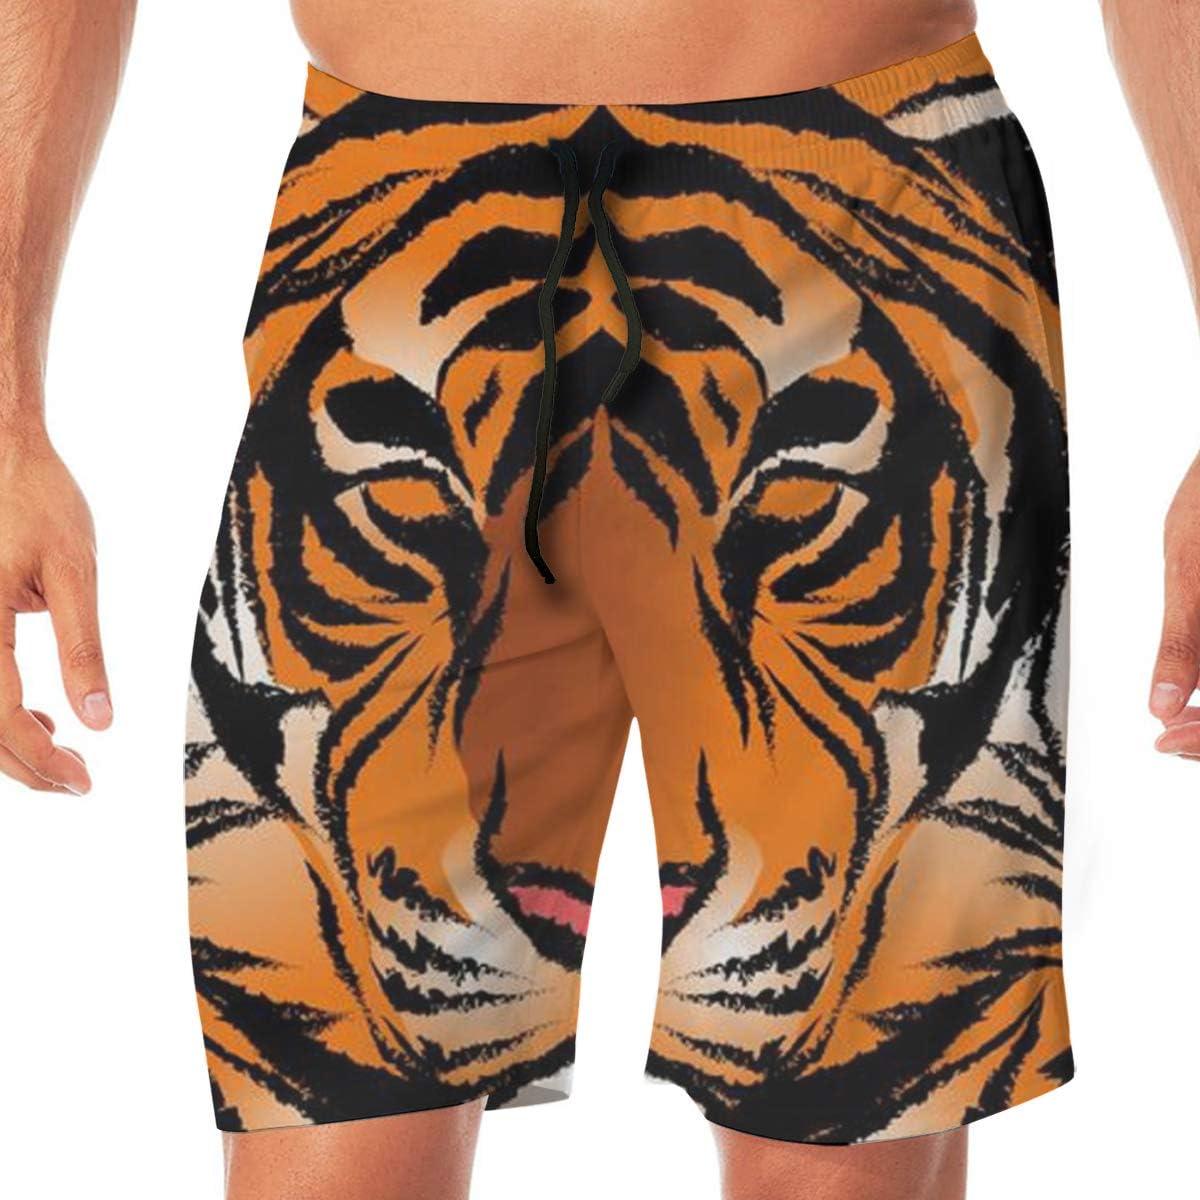 NiYoung Men Big & Tall Swim Trunks Half Pants Essentials Sportwear with Pockets